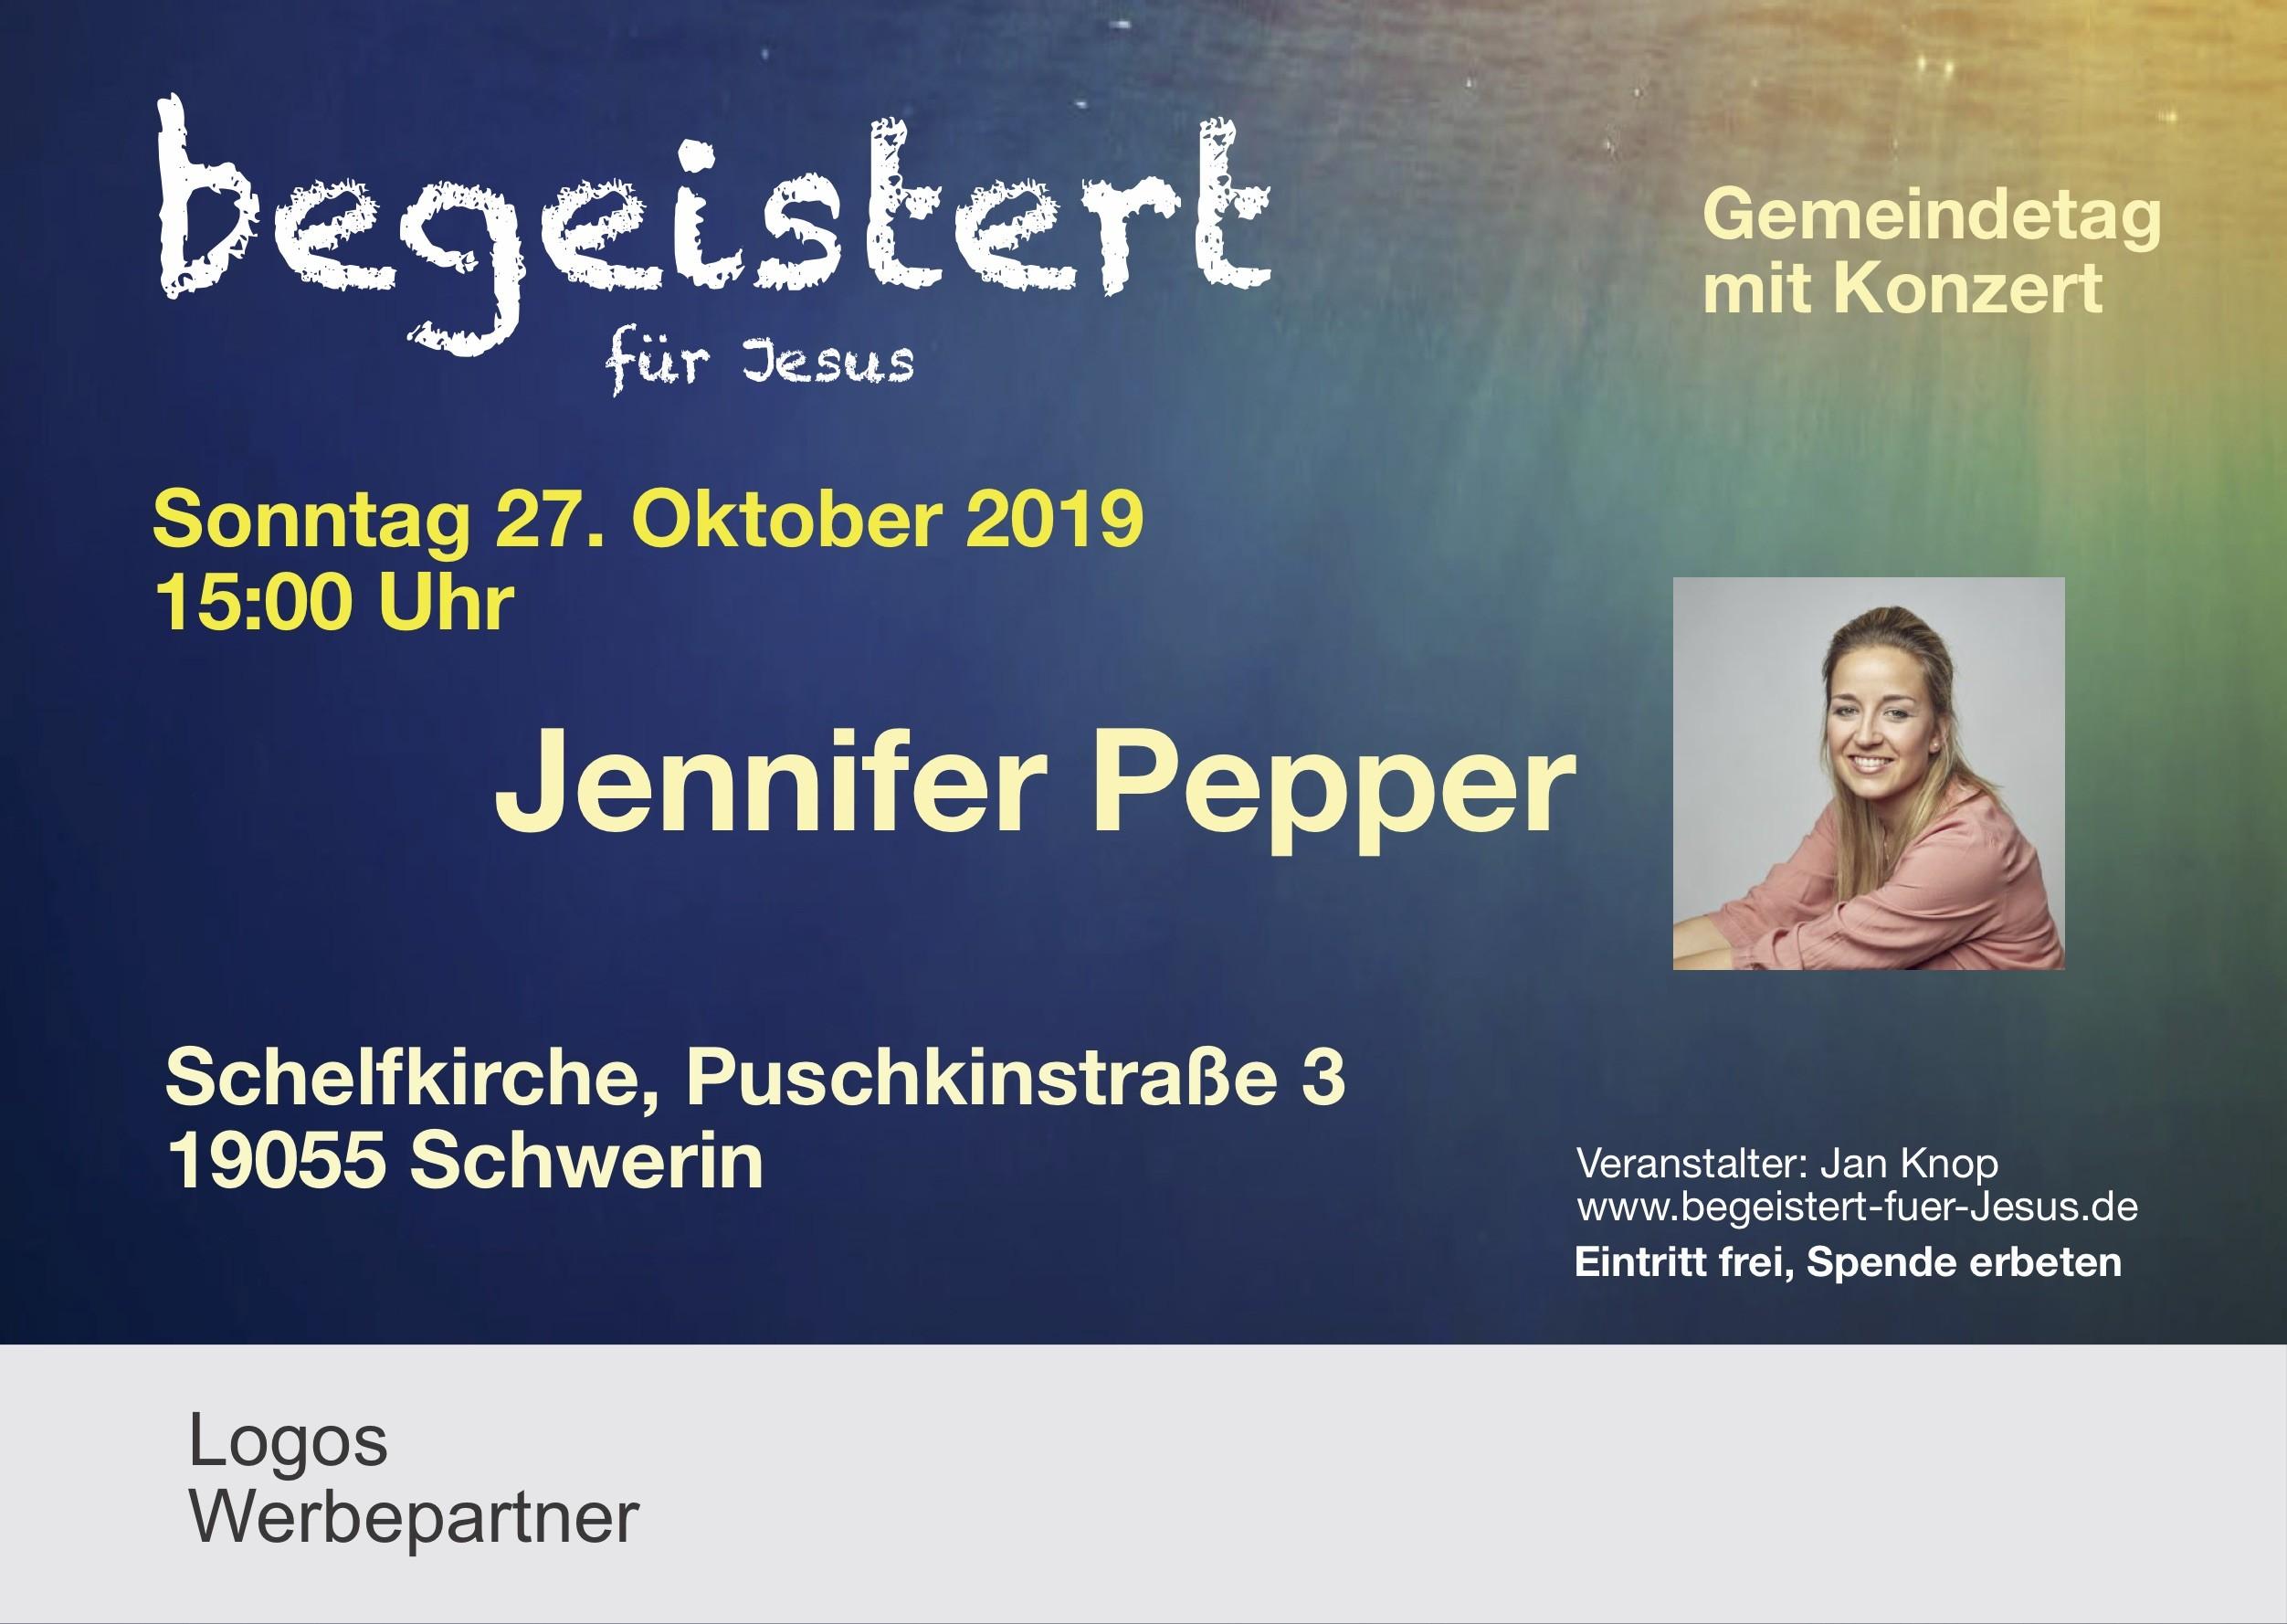 Jennifer Pepper